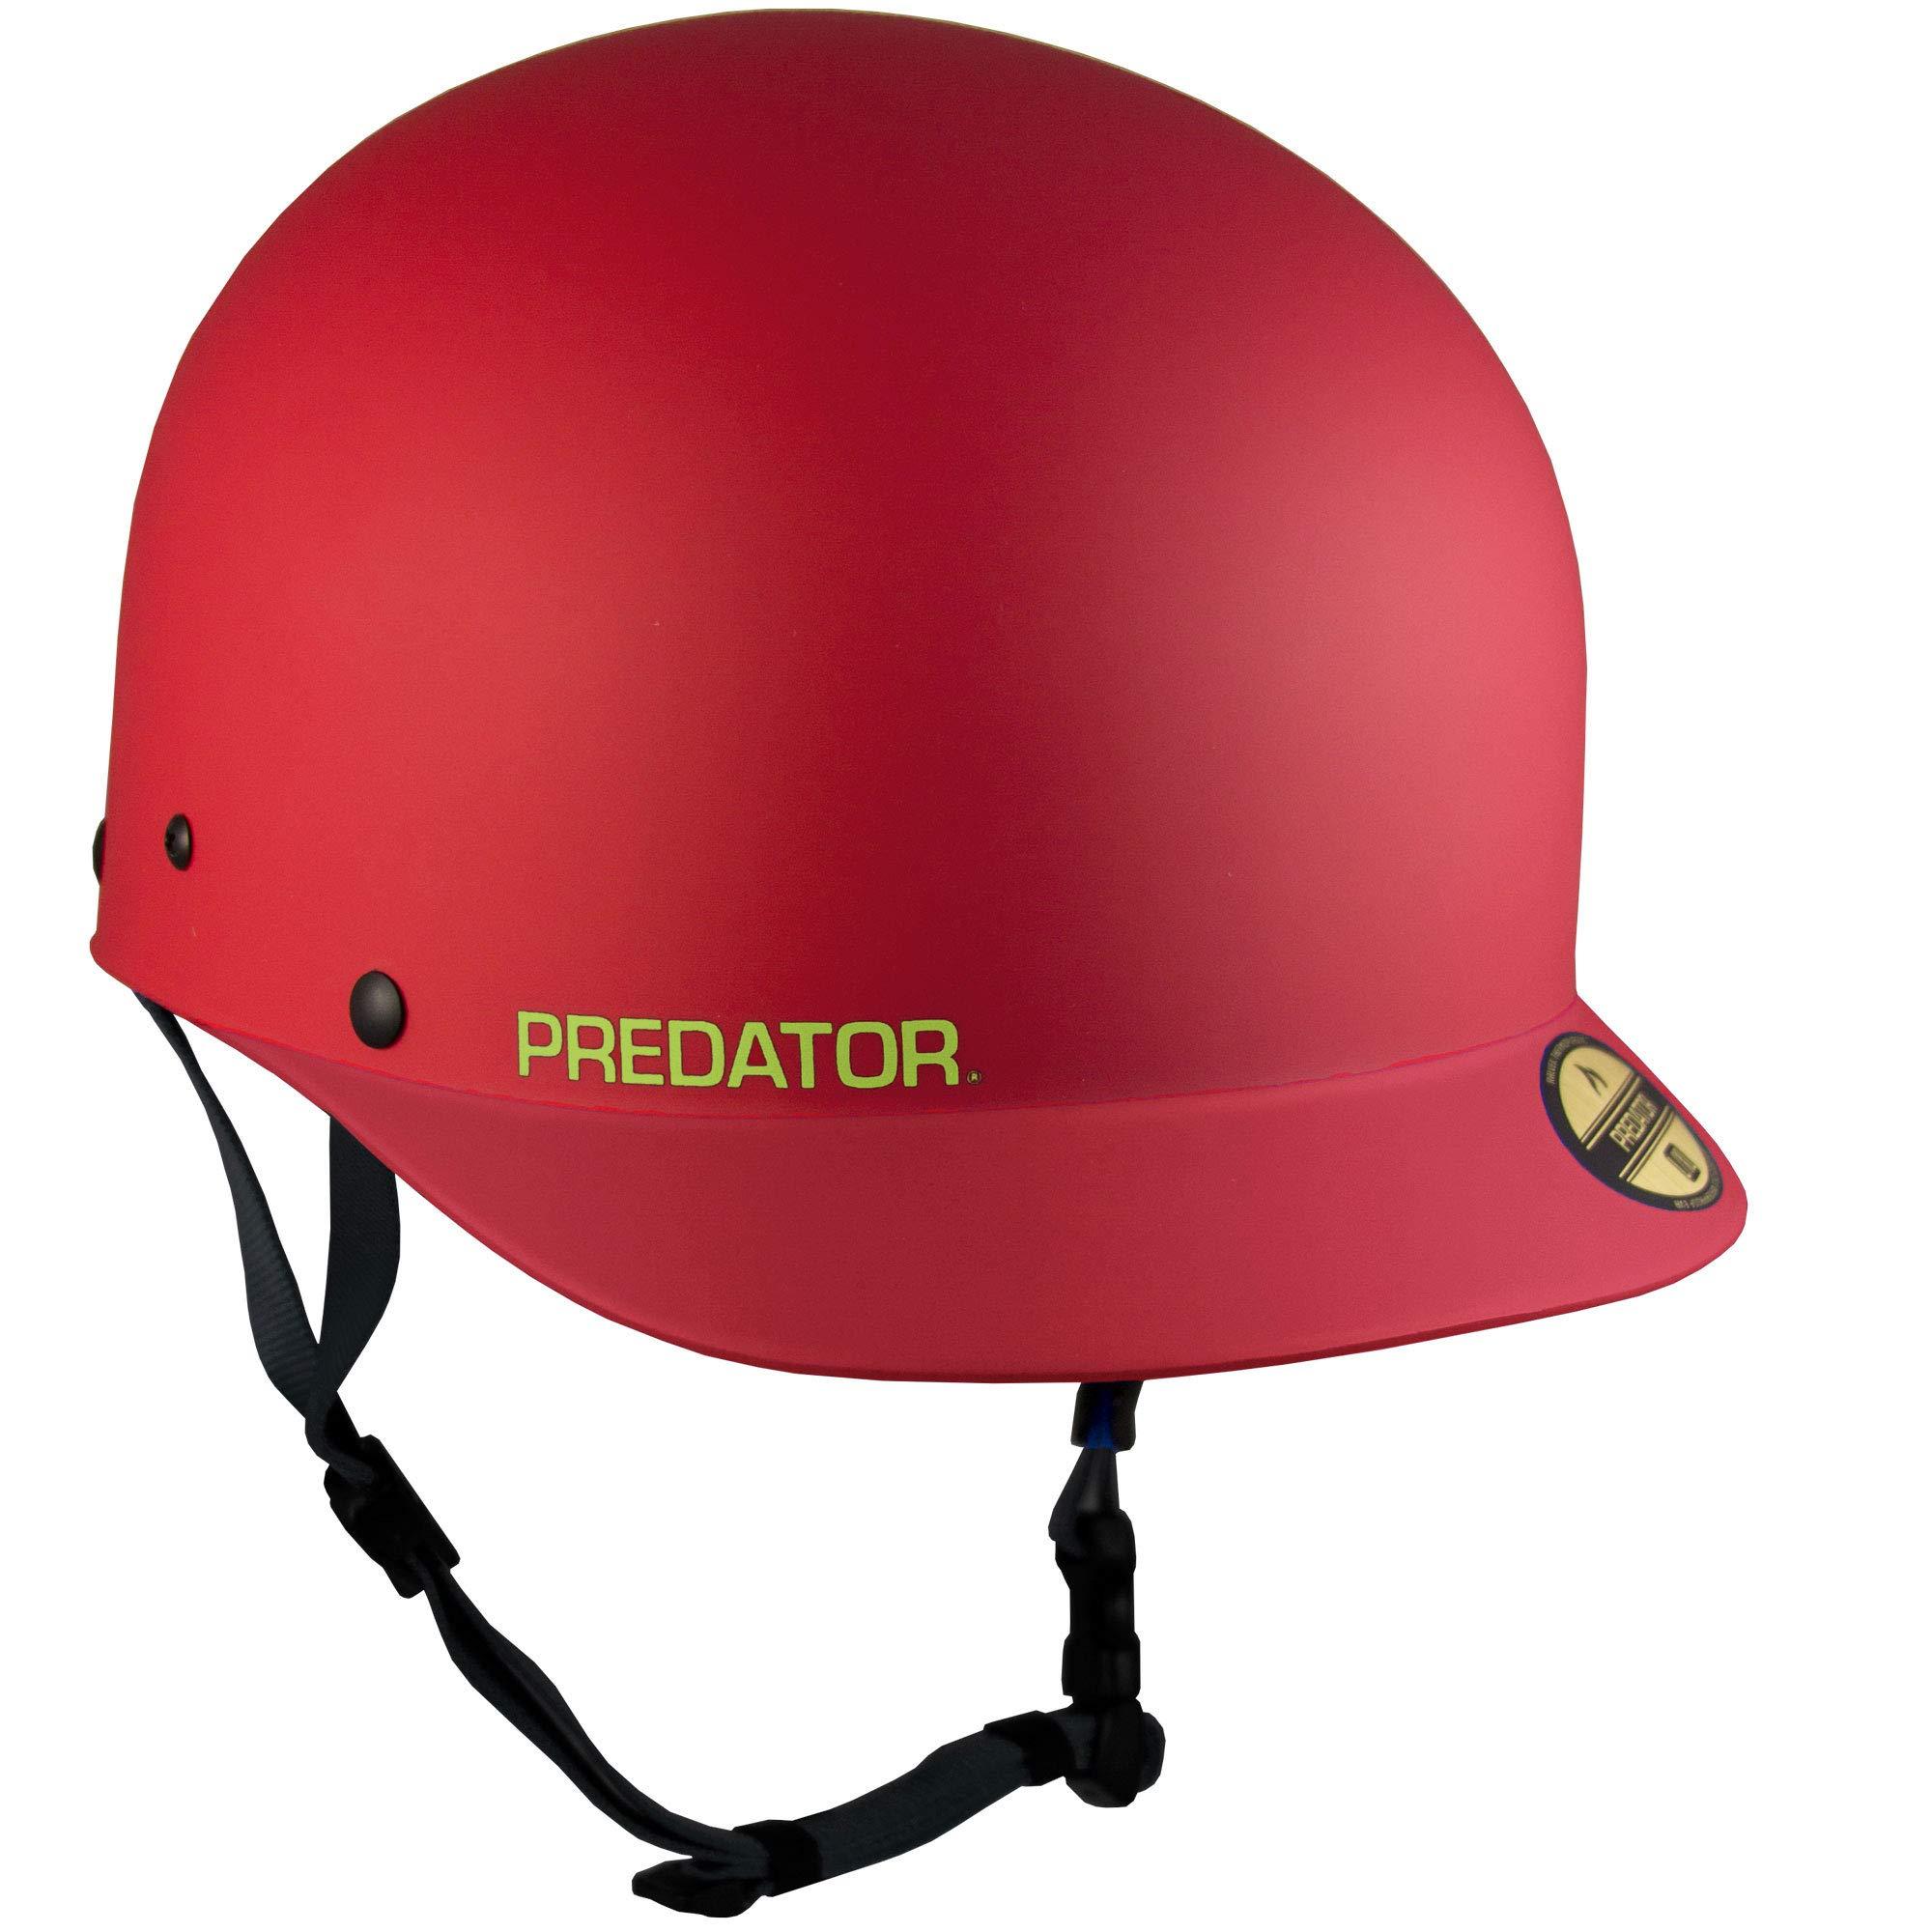 Predator Shiznit Kayak Helmet-Mattered-S/M by Predator